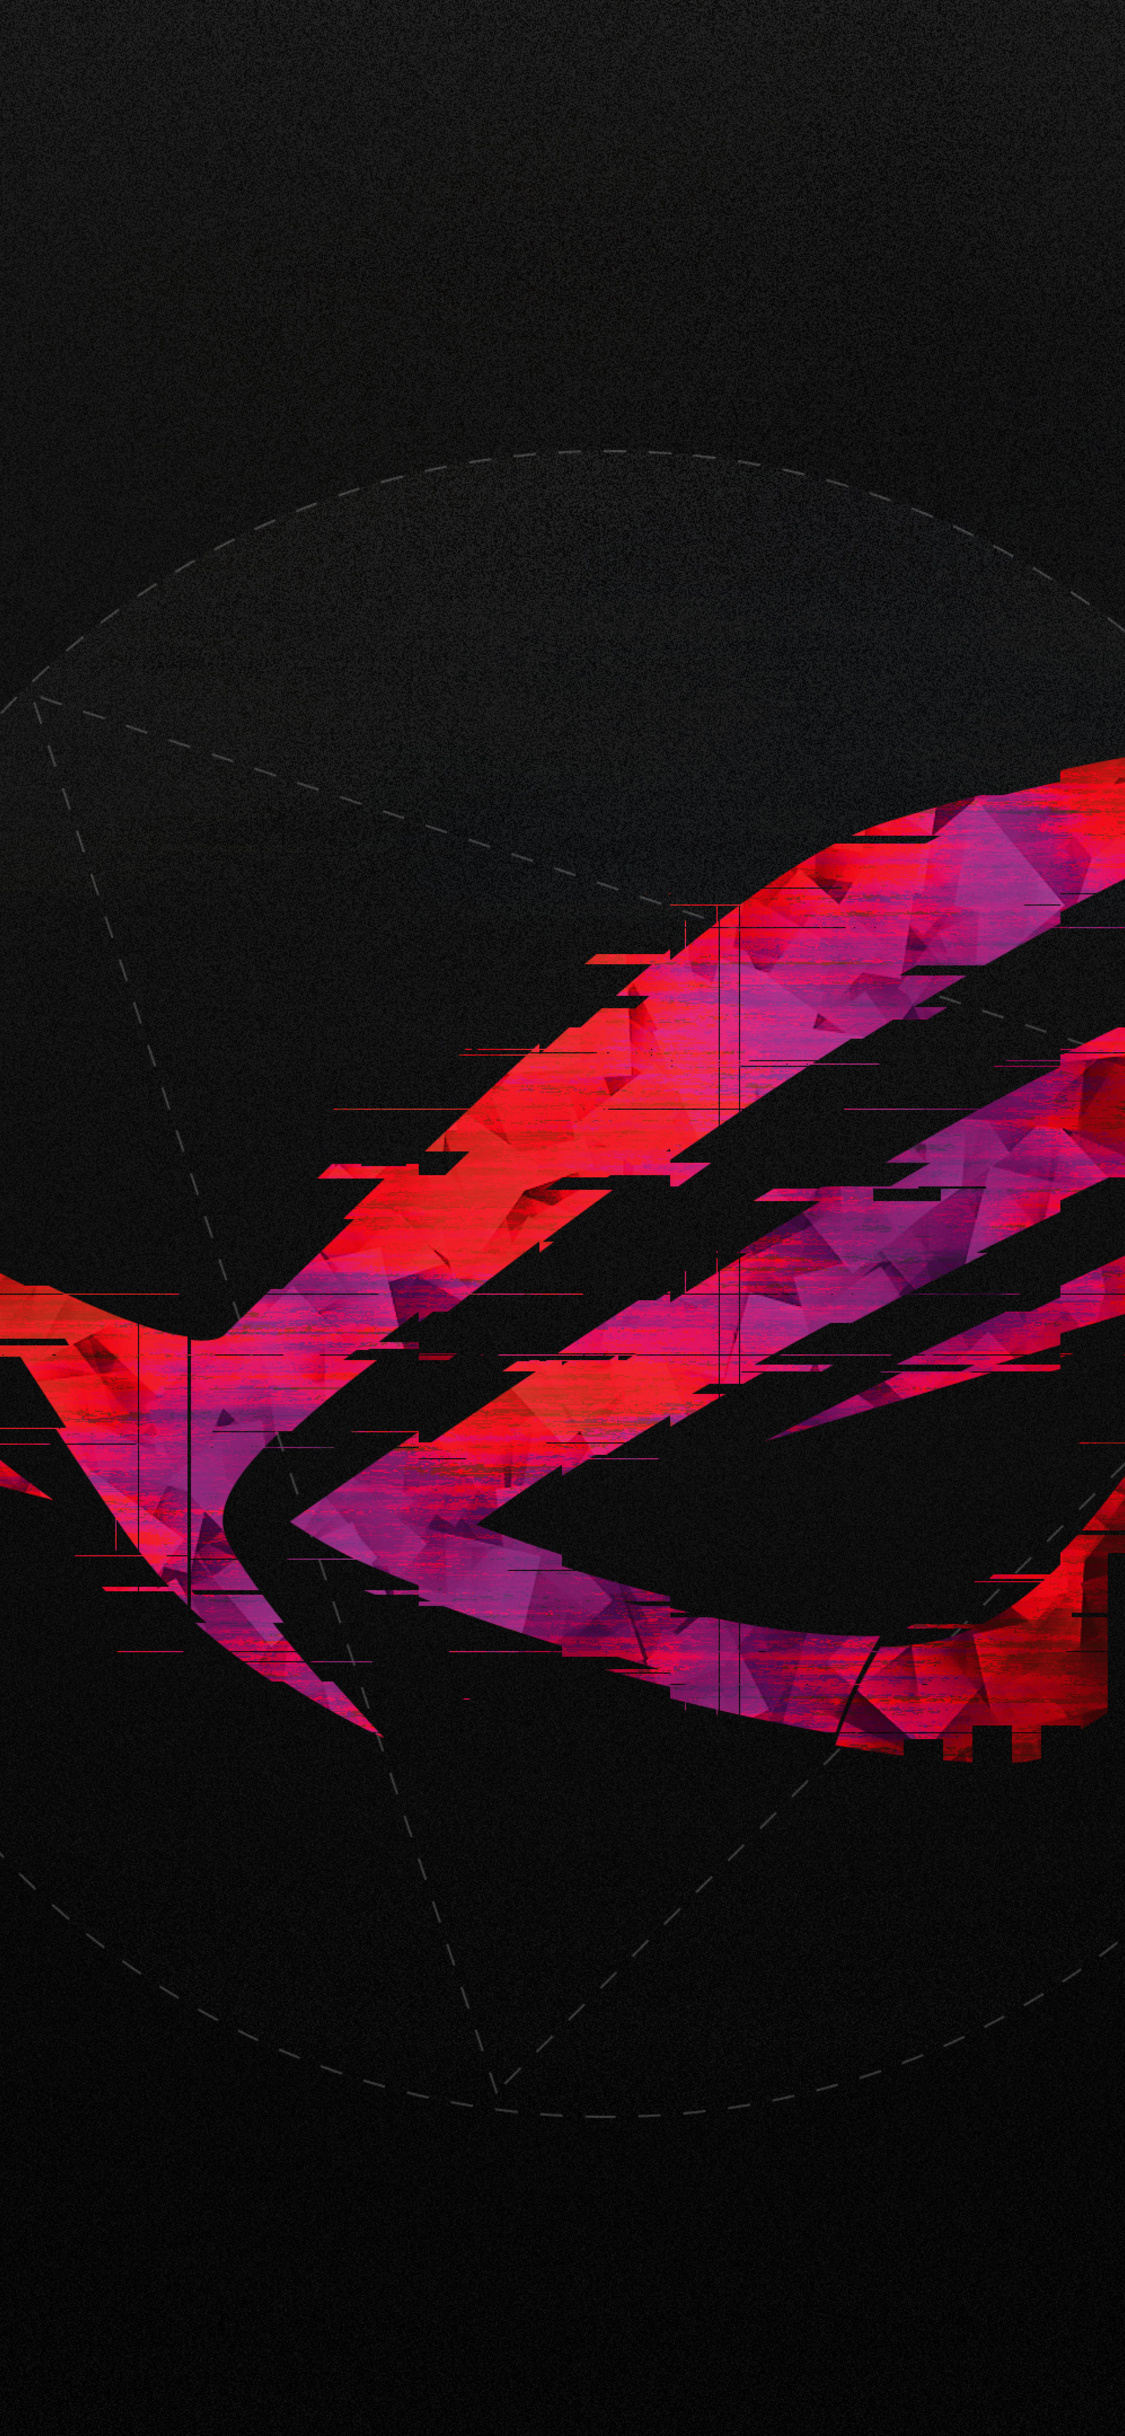 rog-abstract-eu.jpg